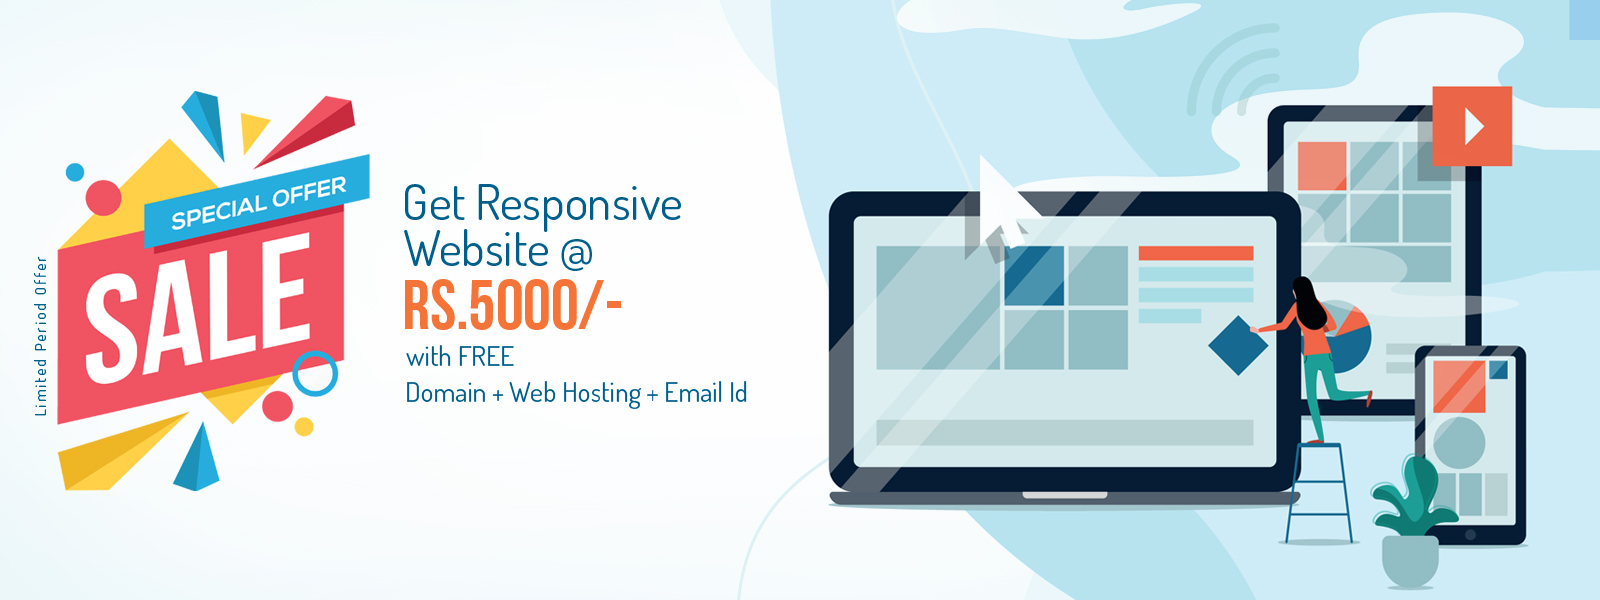 Top Page Keywords Ranking - Web Designing Company in Mumbai